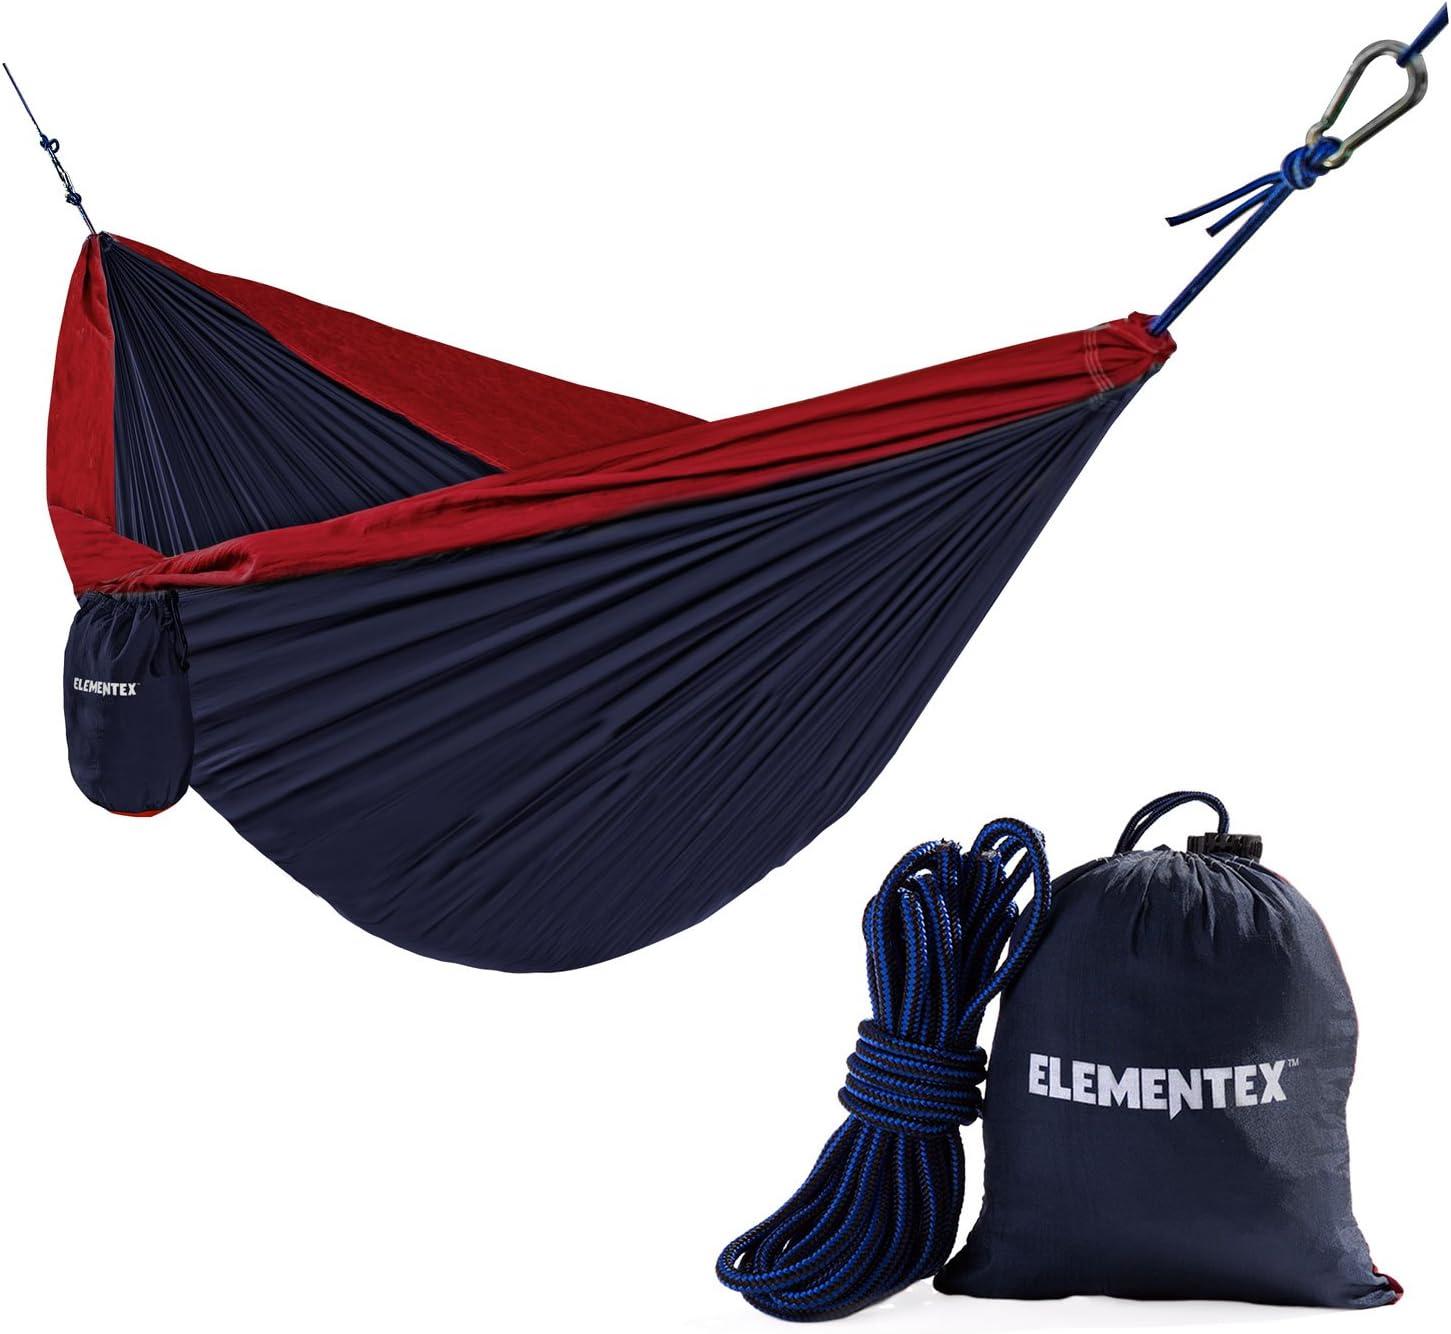 ELEMENTEX Portable Parachute Nylon Travel Camping Hammock